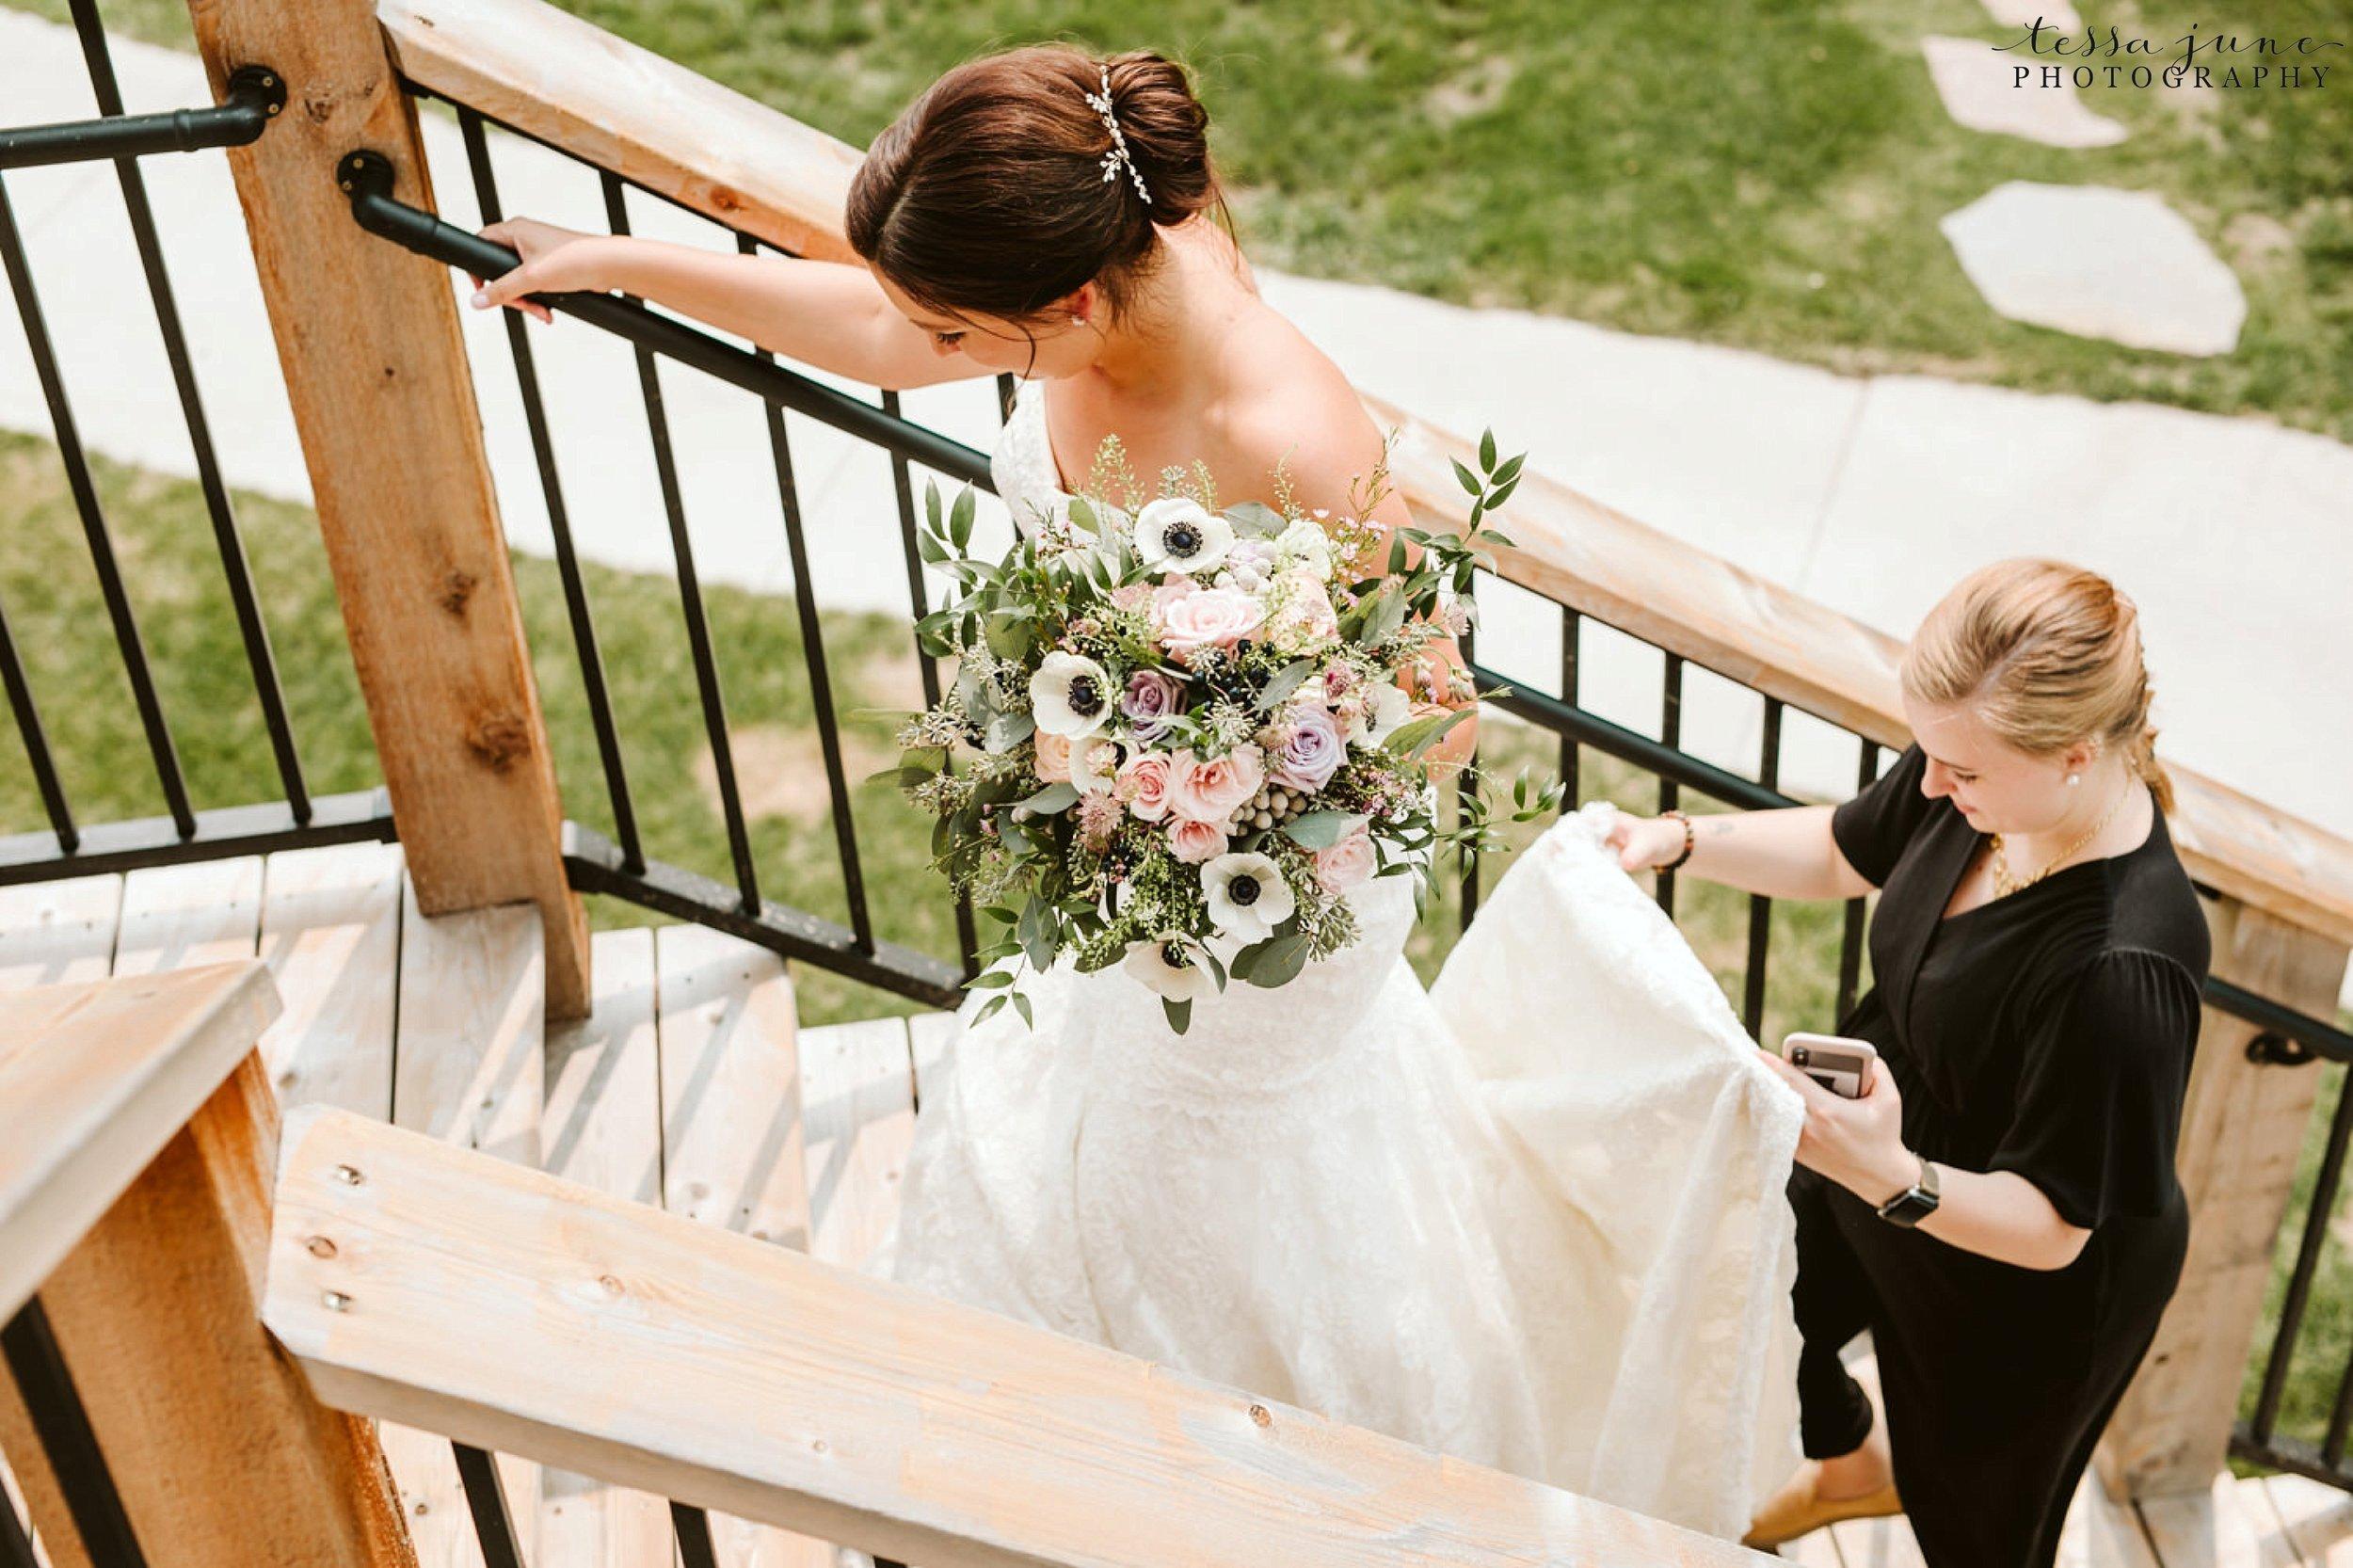 gathered-oaks-barn-wedding-alexandria-minnesota-21.jpg